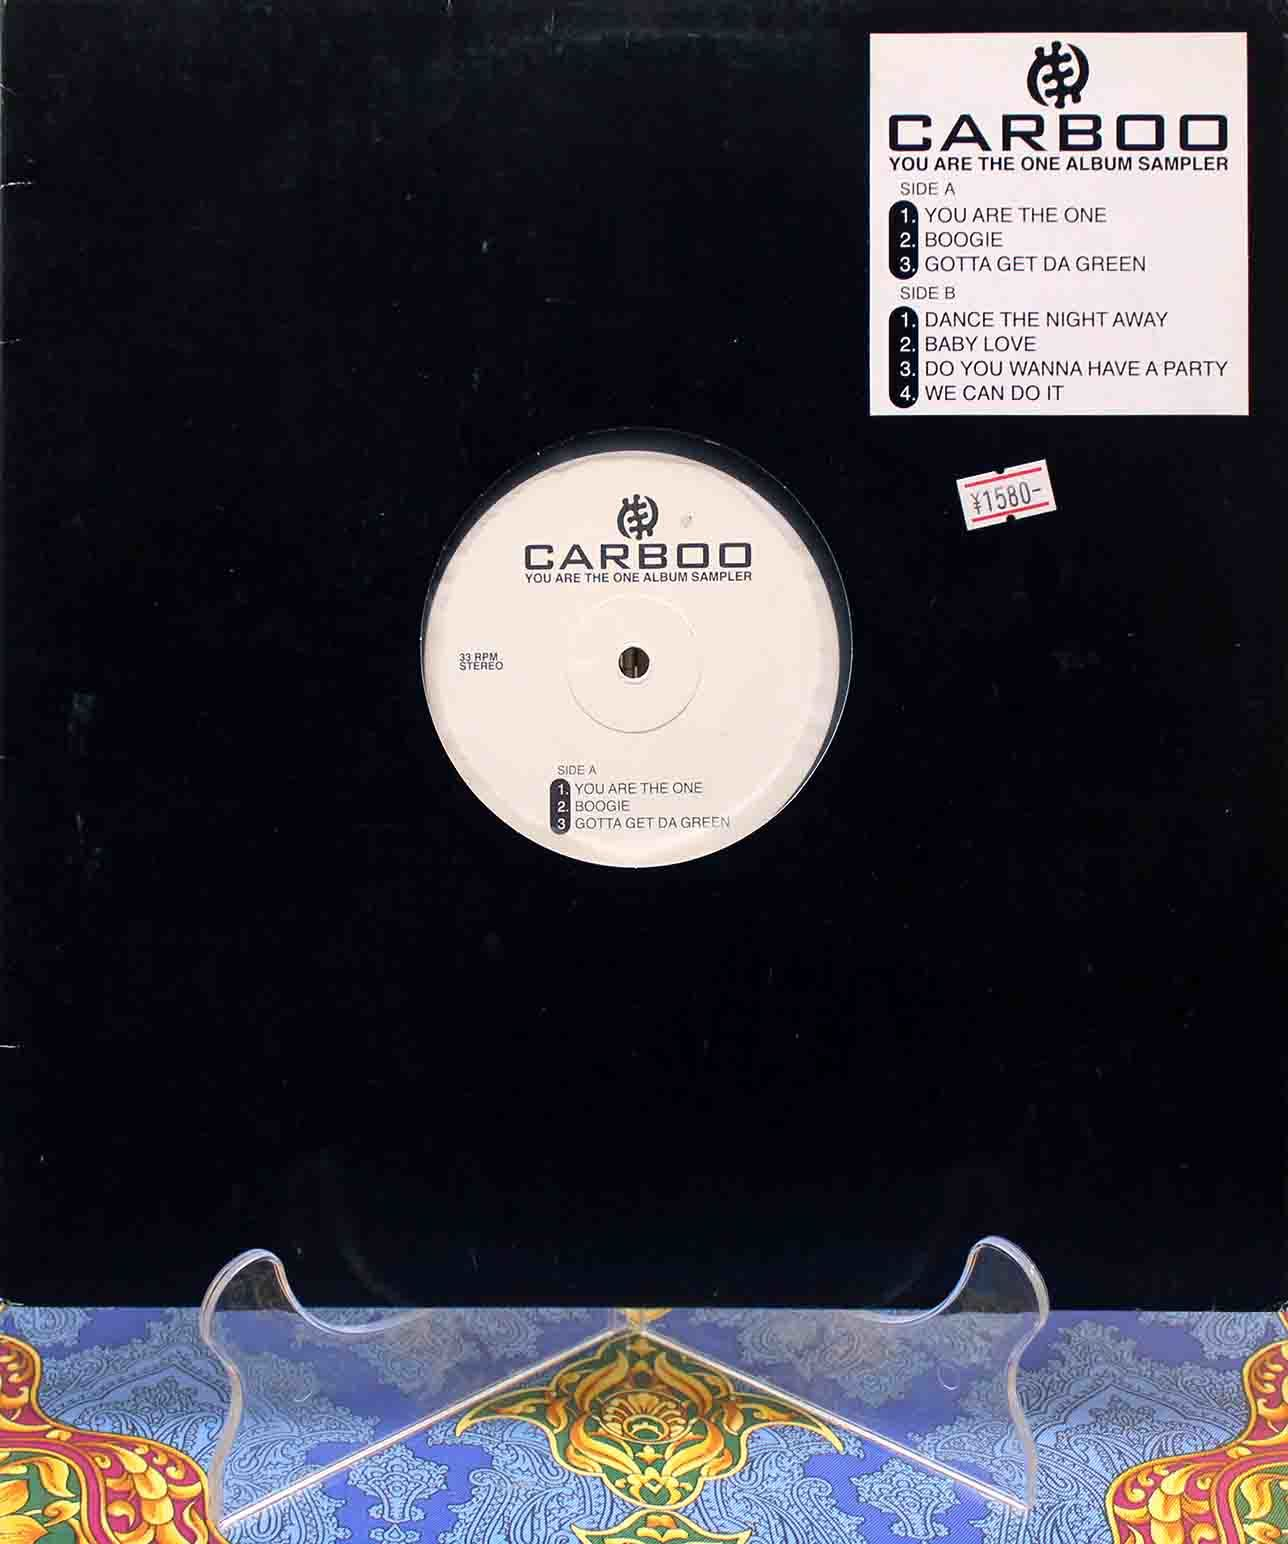 carboo Promo 12 01